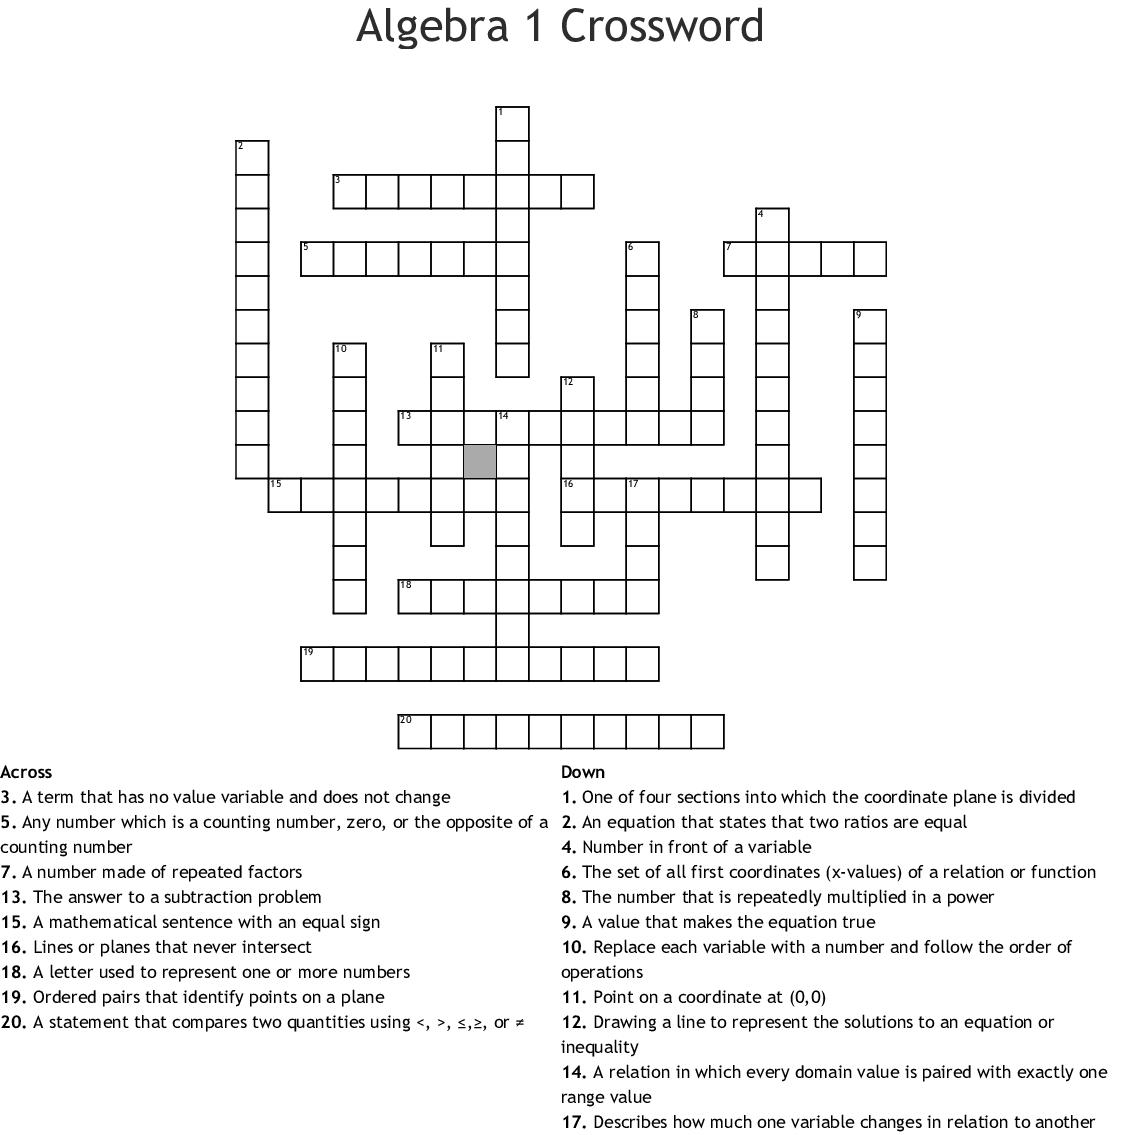 Algebra 1 Crossword